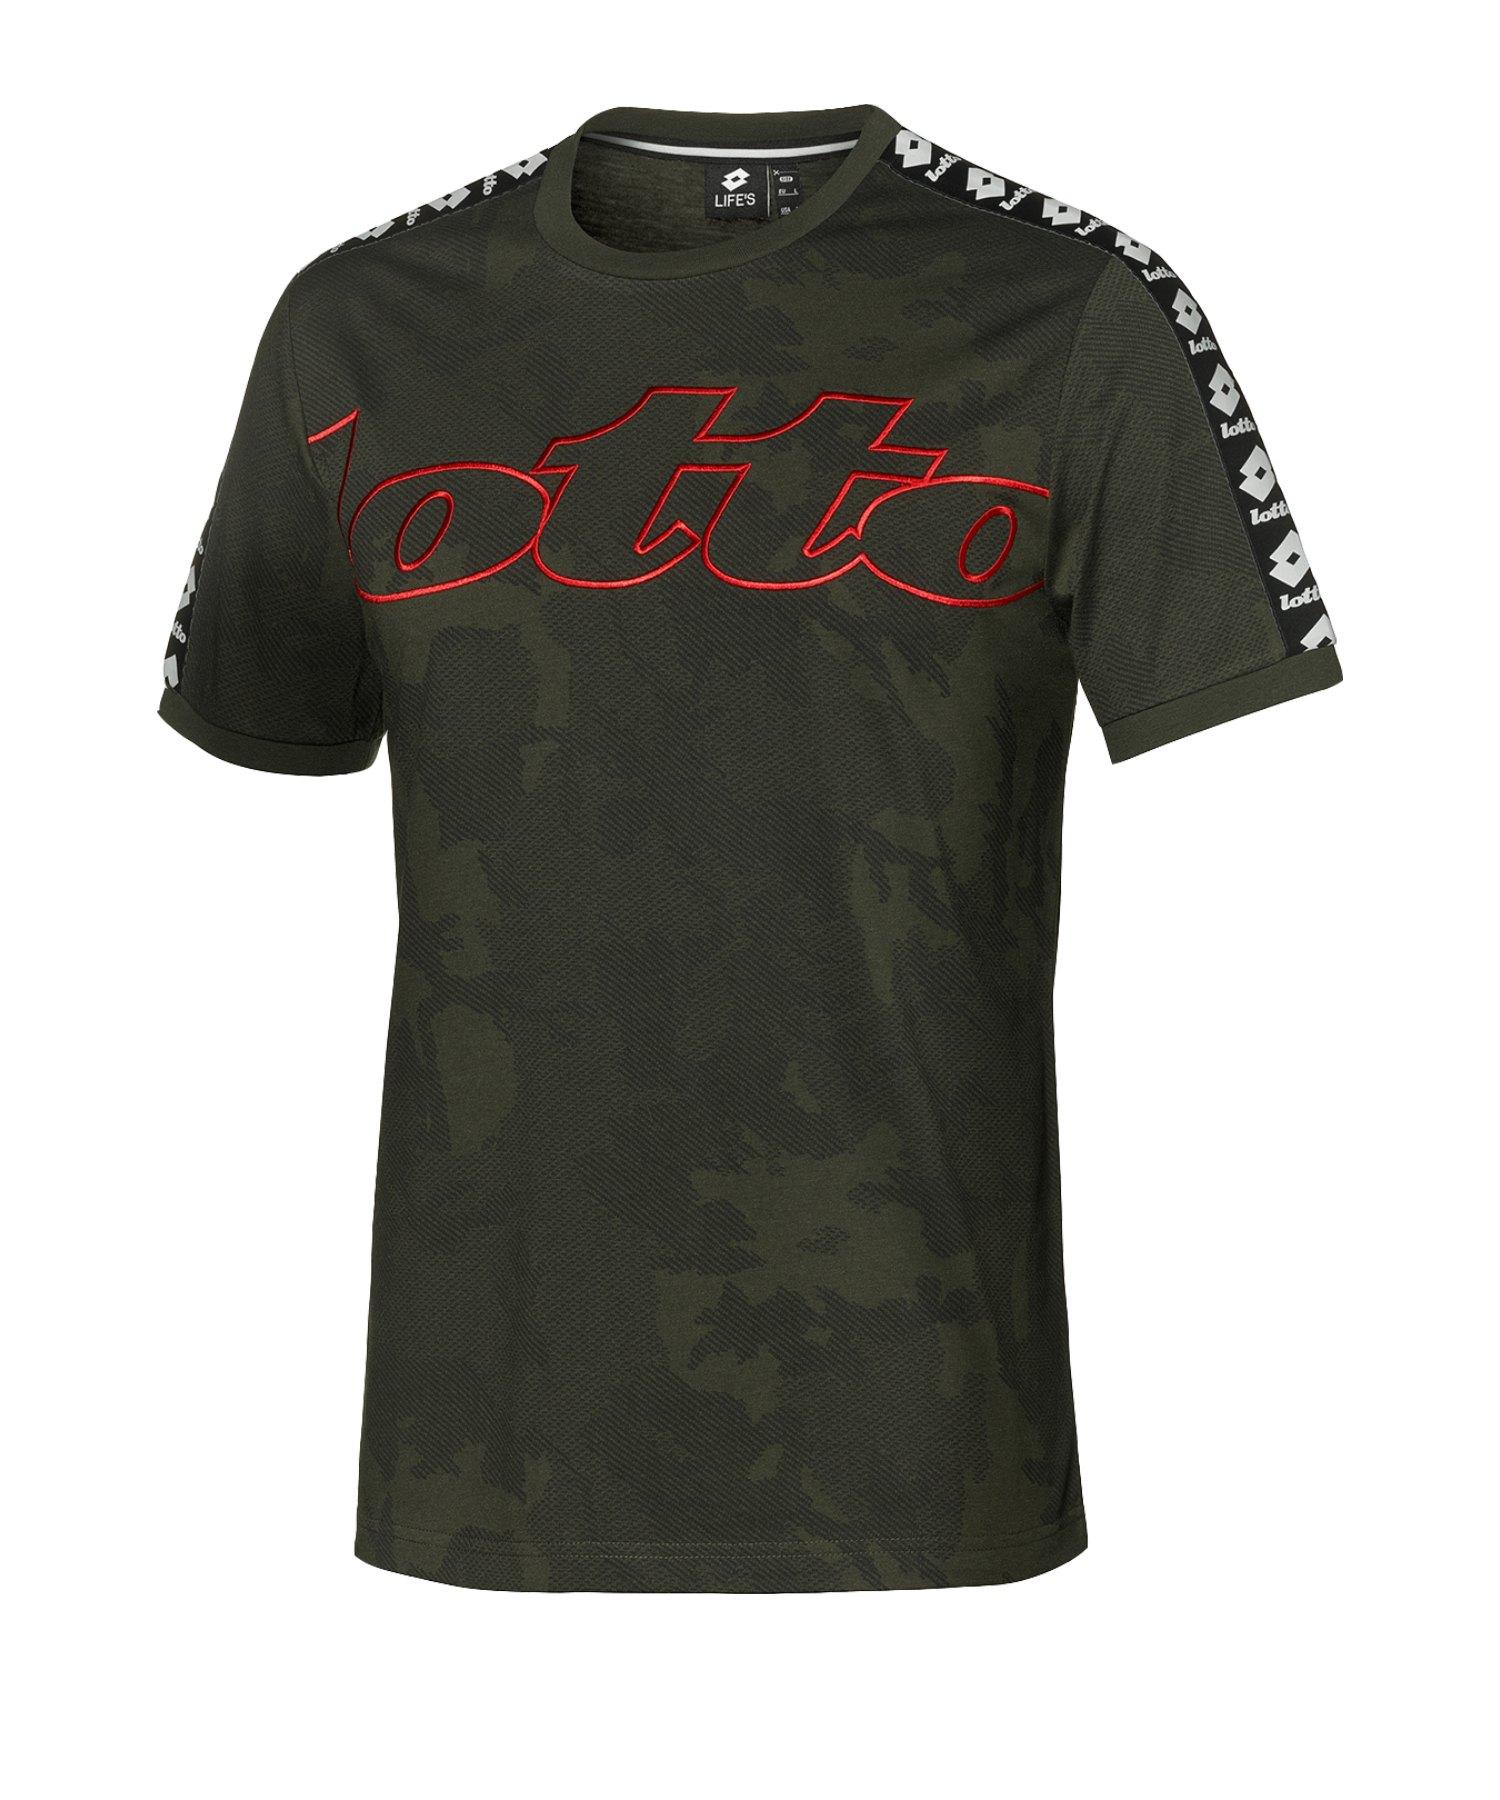 Lotto Athletica III Tee T-Shirt Grün F26O - gruen